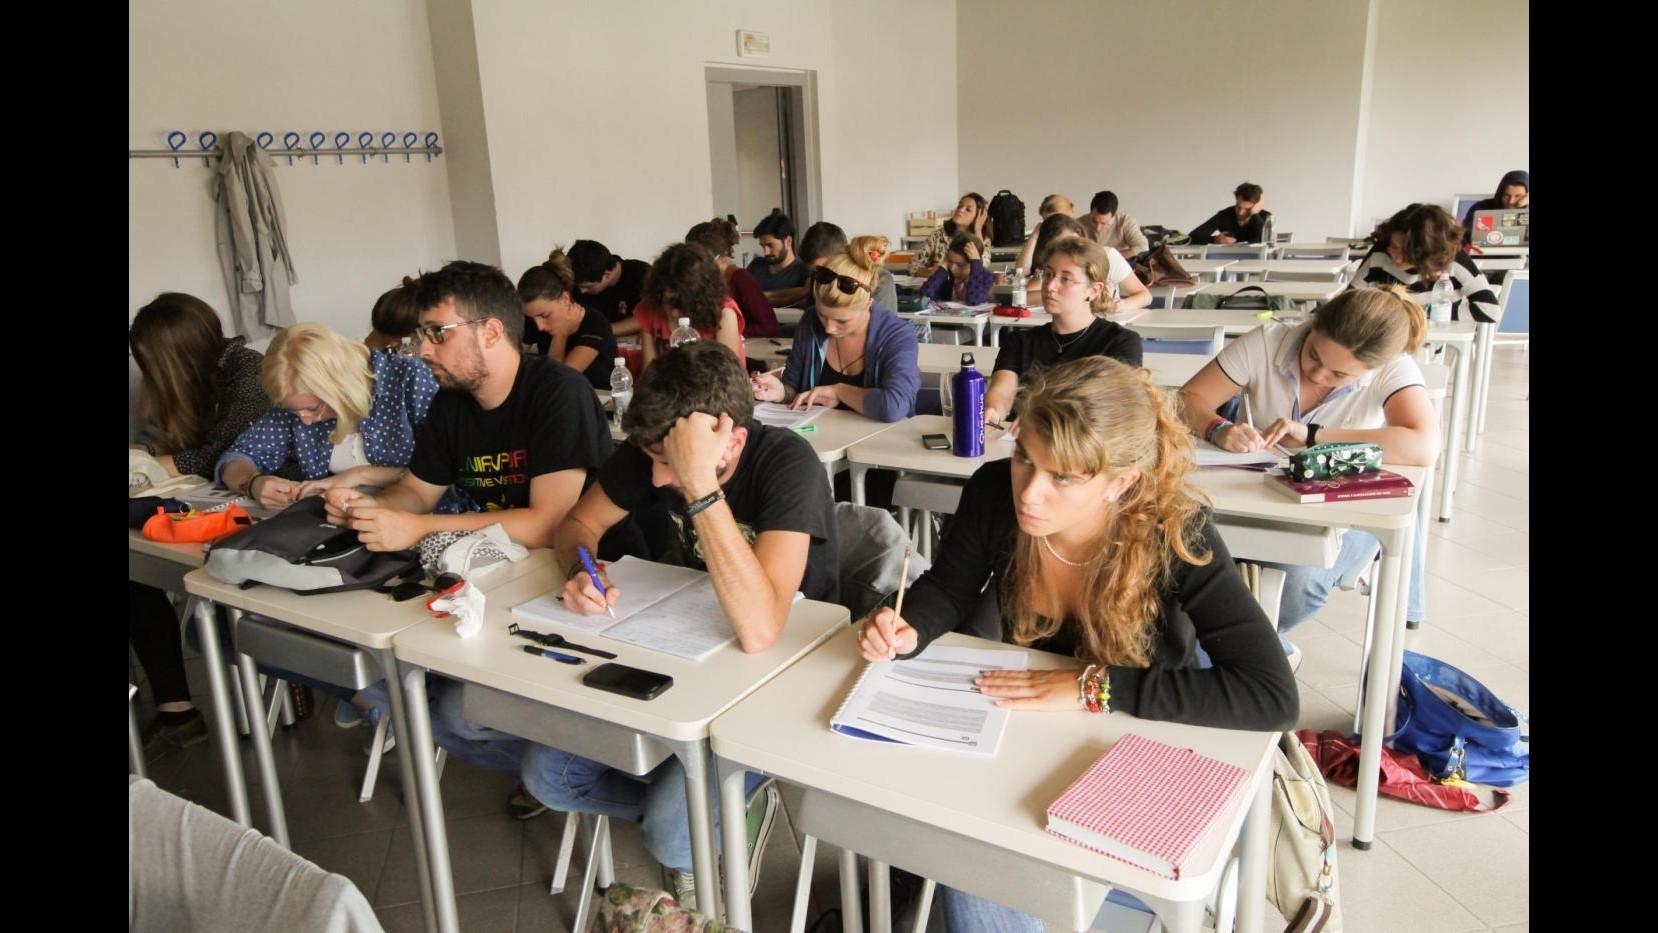 Scuola, Codacons: In arrivo stangata per famiglie, spesa media 840 euro